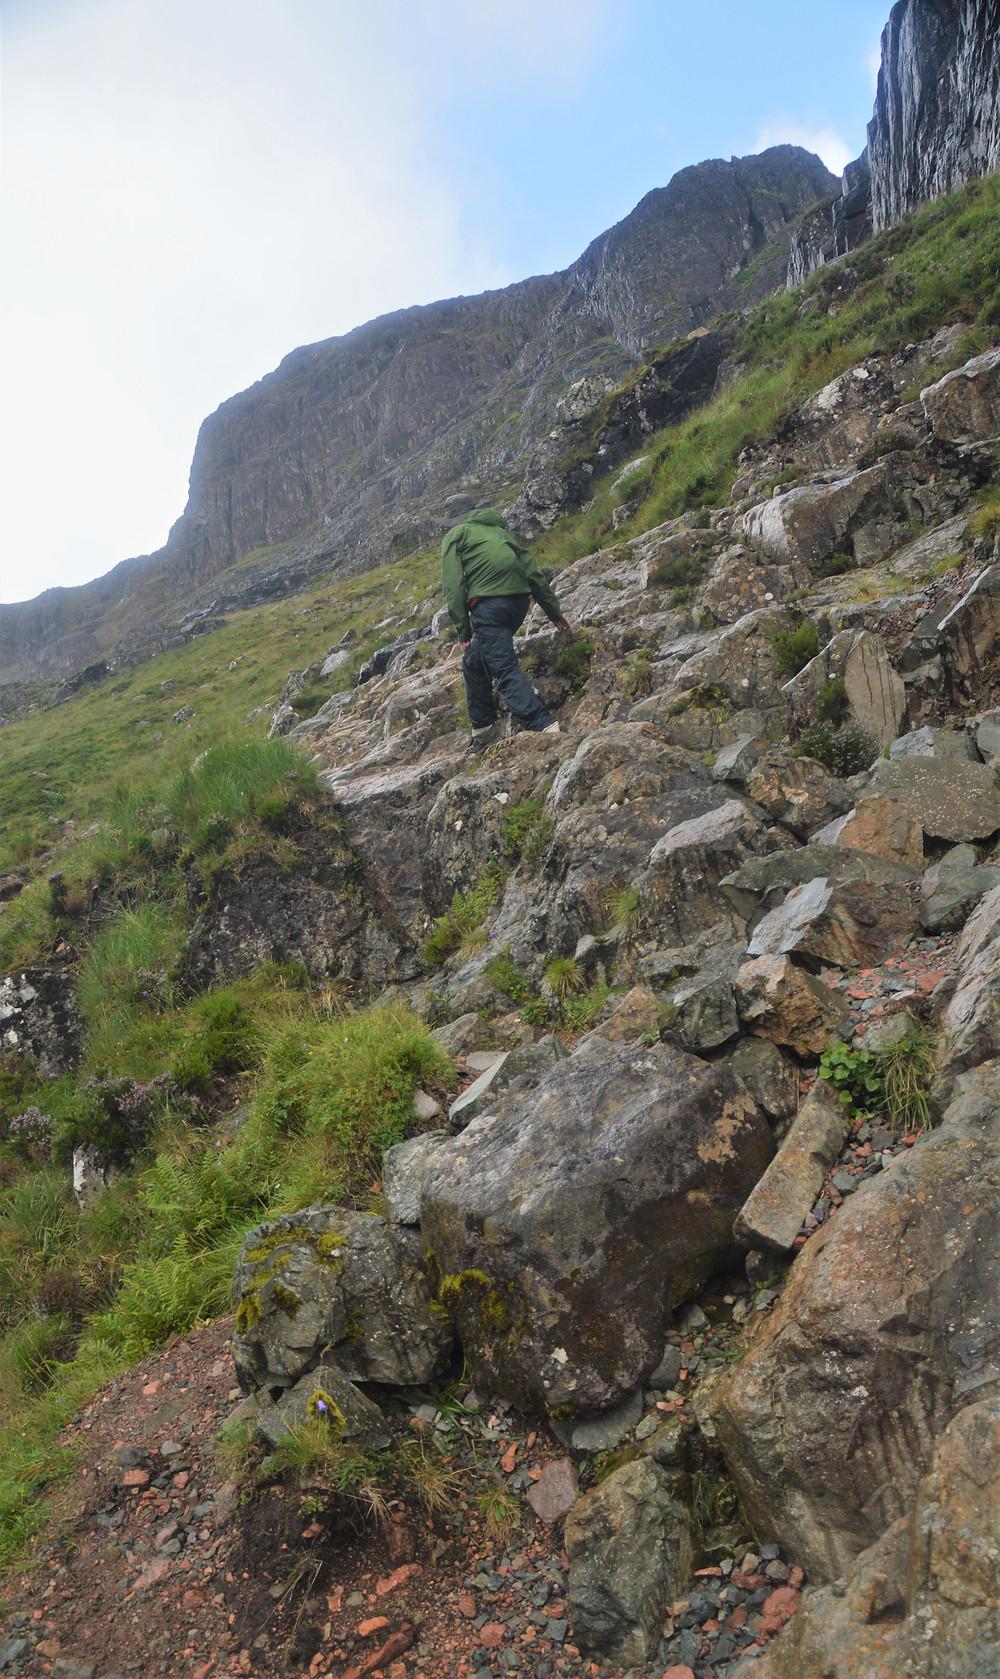 Hiking Buachaille Etive Mòr via the steep rock ledge in Coire na Tuliach path in the Scottish Highlands